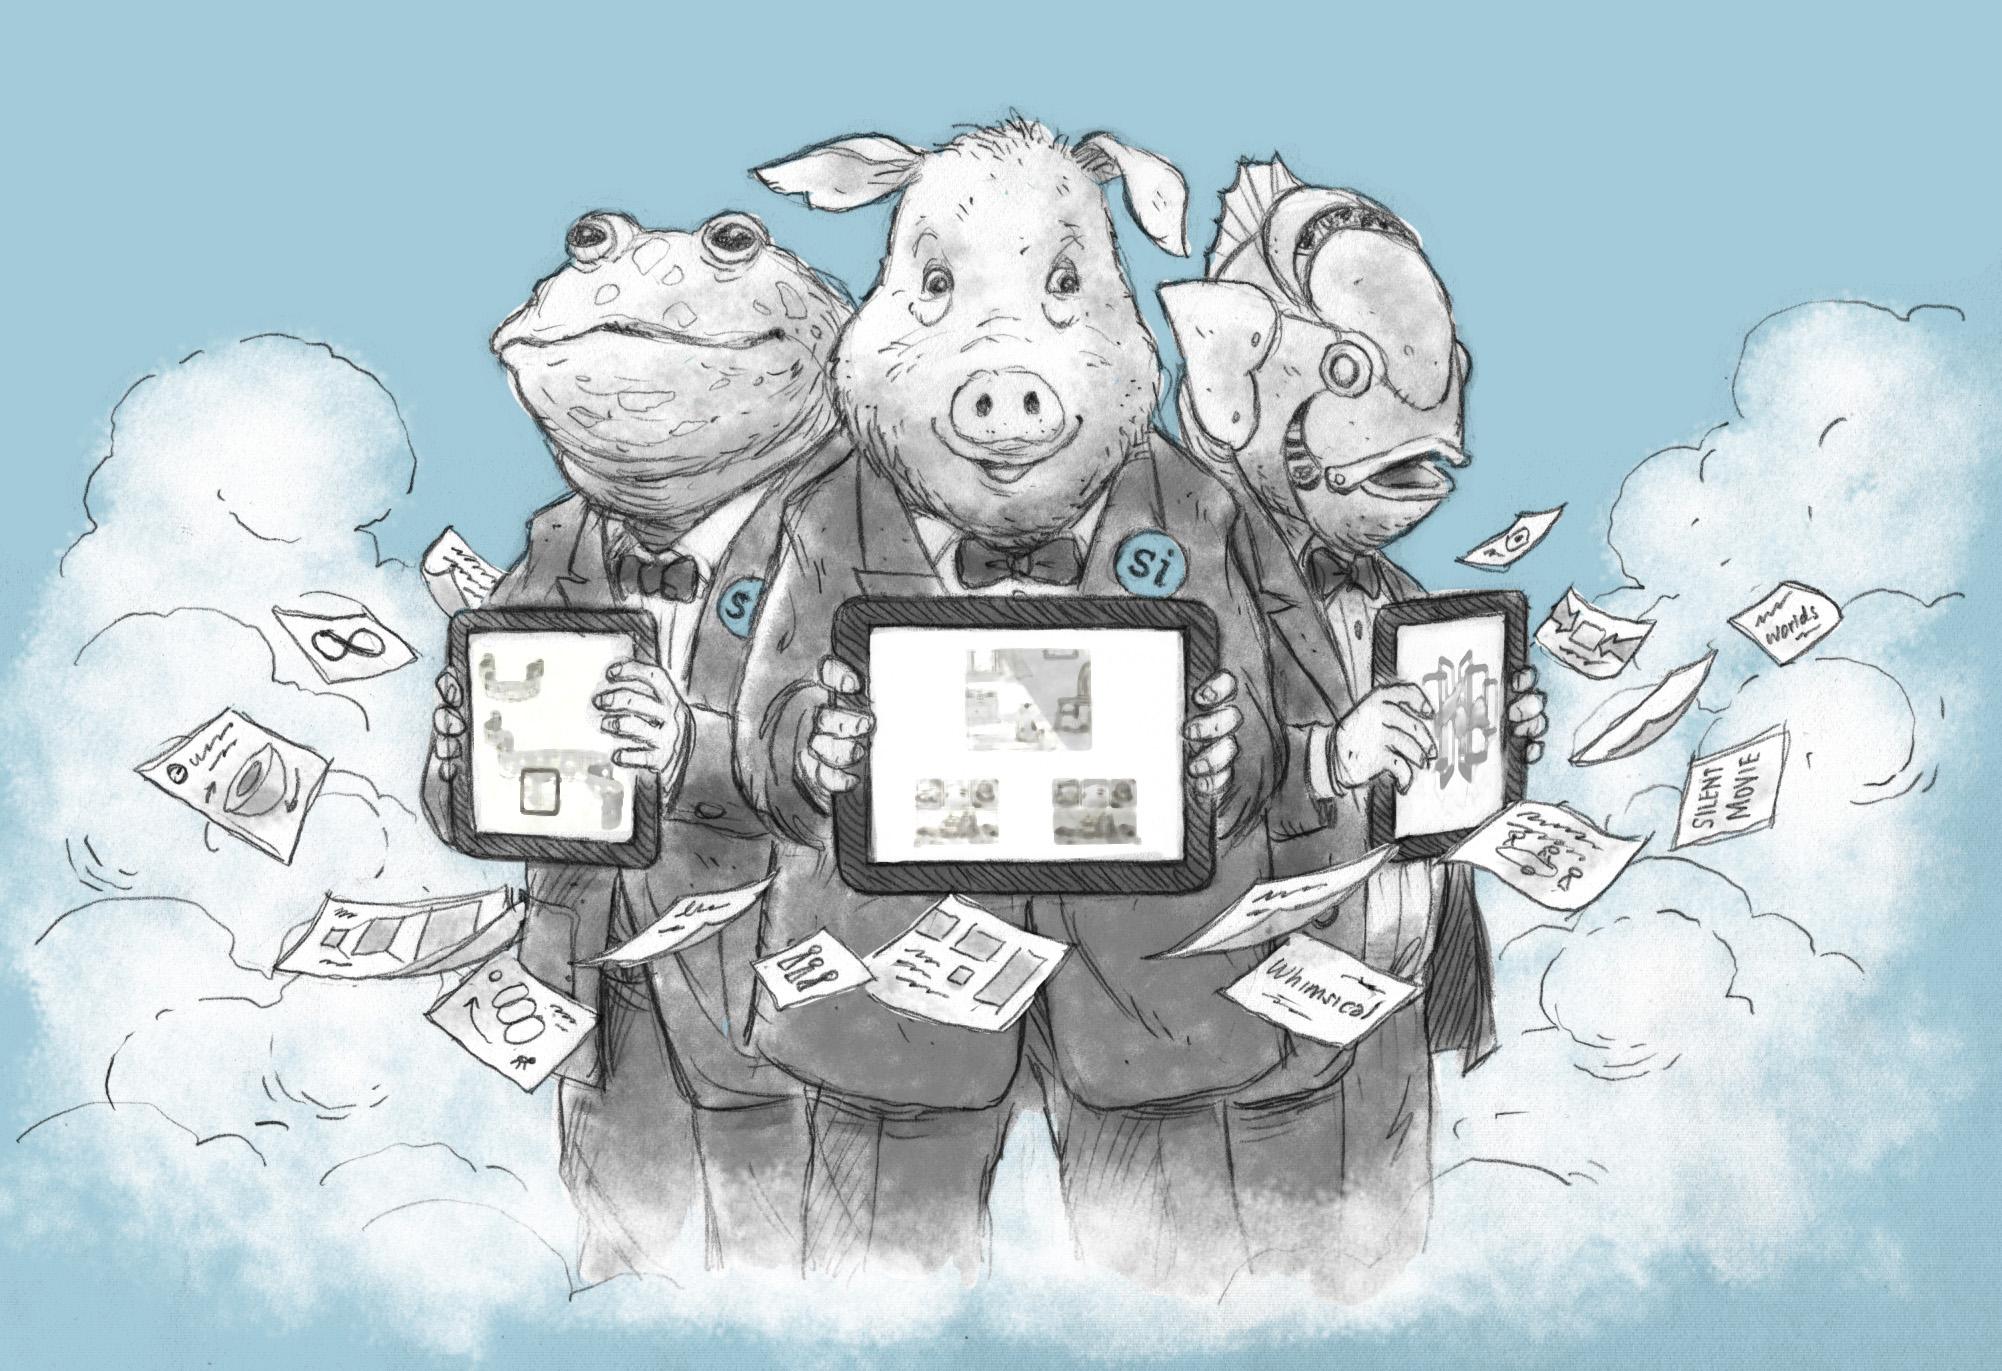 Concept sketch / App proposal   Agency: Smashing Ideas (2012)